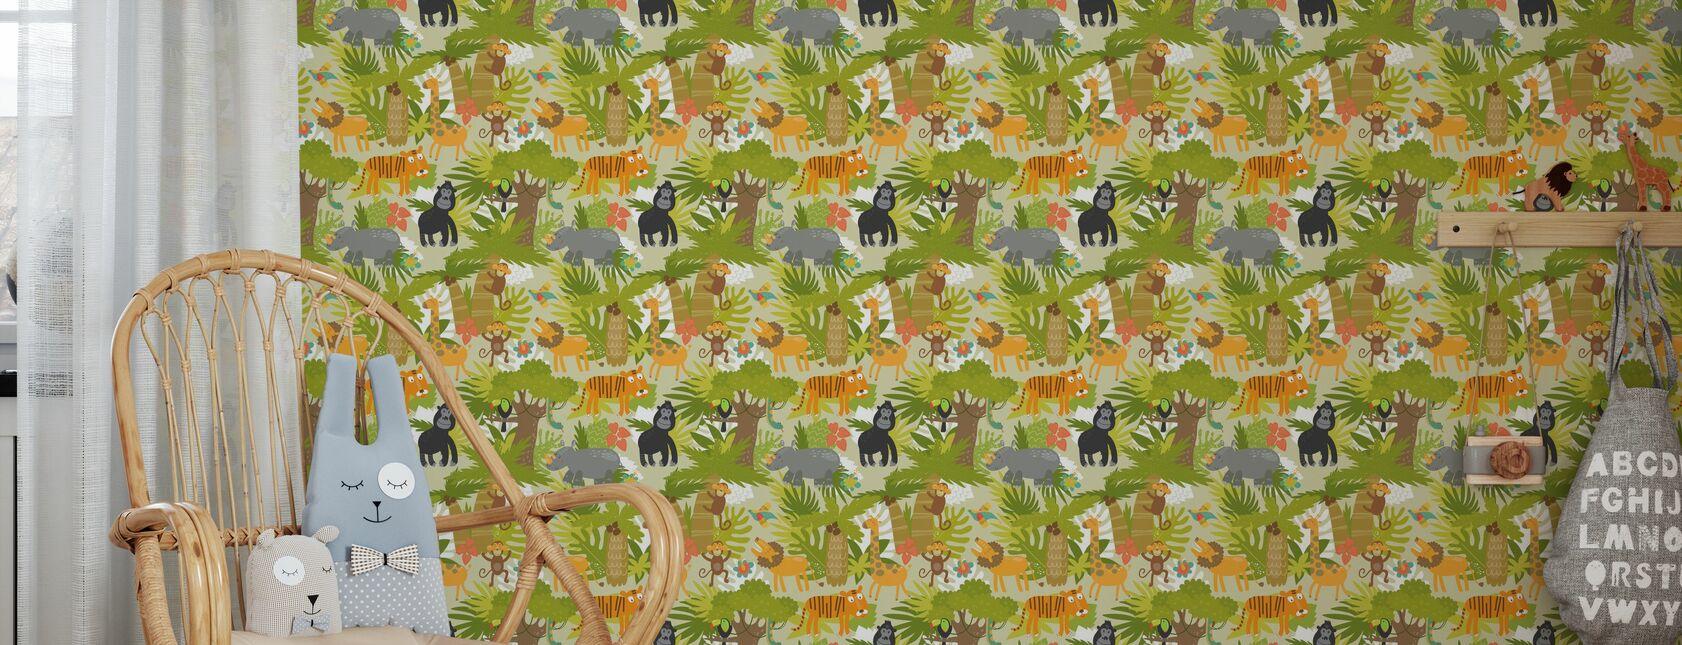 Cute Jungle Animals - Wallpaper - Kids Room